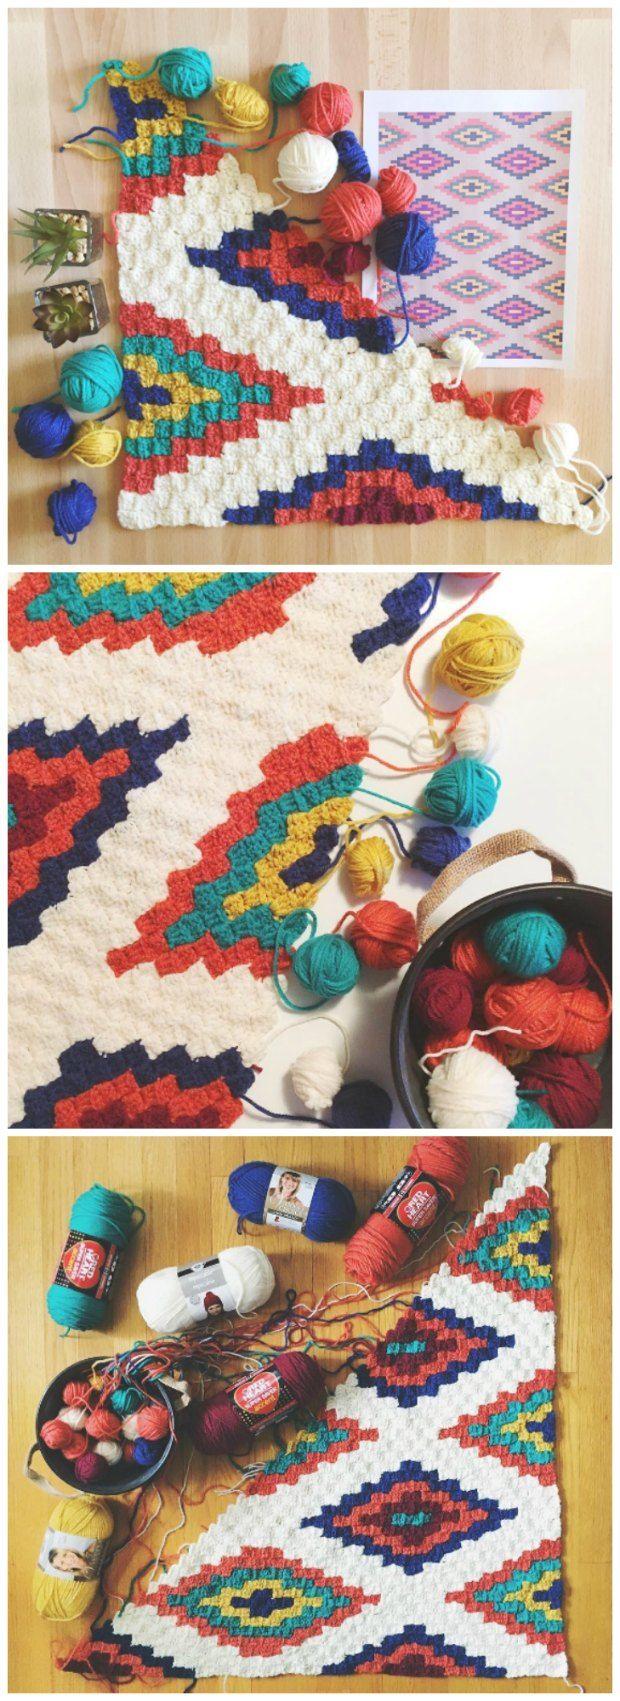 Corner To Corner Crochet Southwestern Afghan Throw blanket | Patrón ...